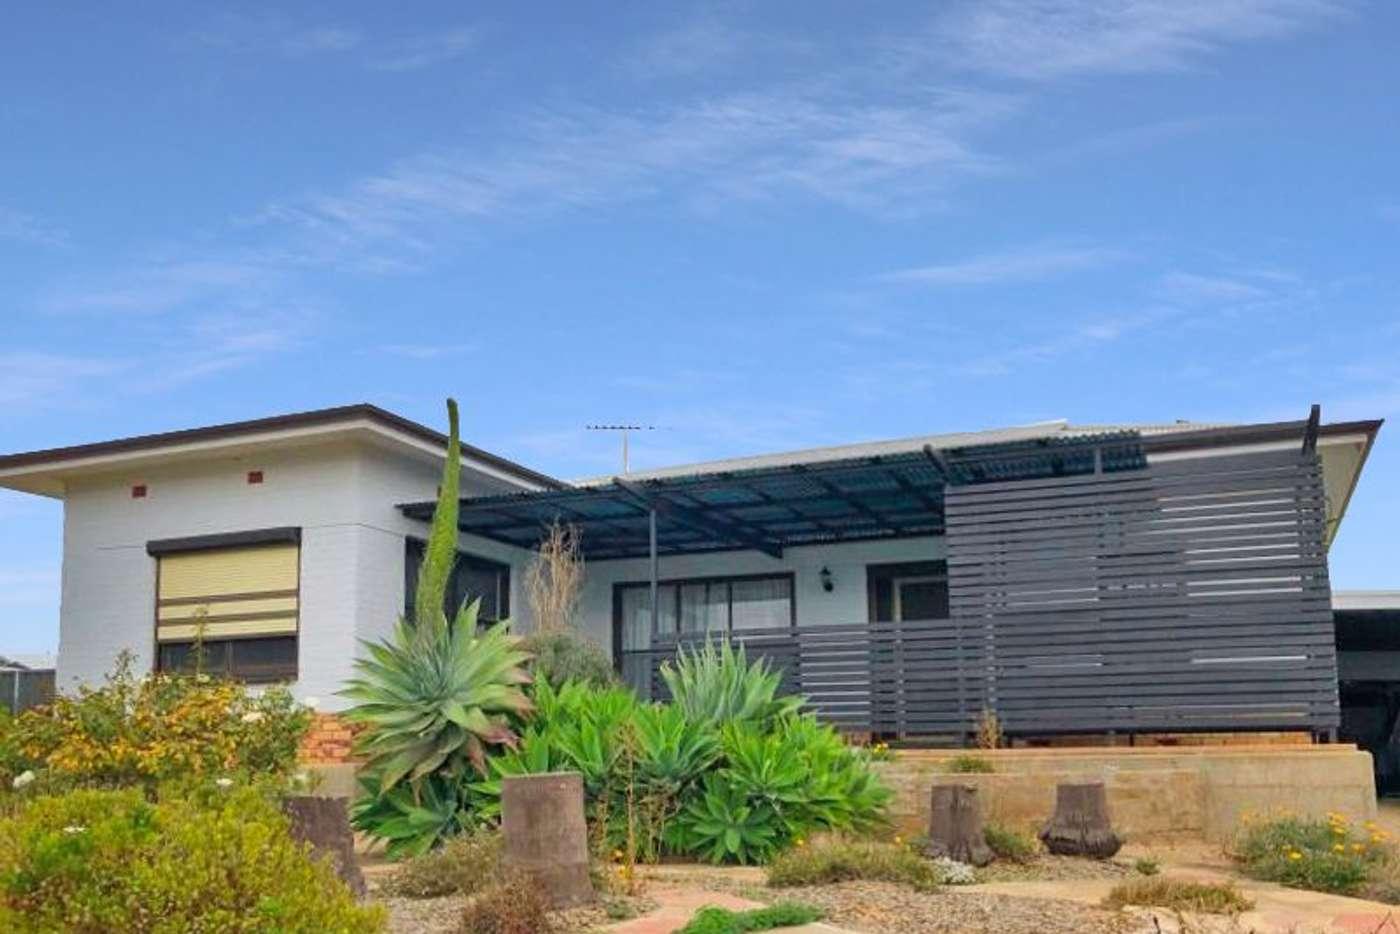 Main view of Homely house listing, 53 Hill Street, Murray Bridge SA 5253